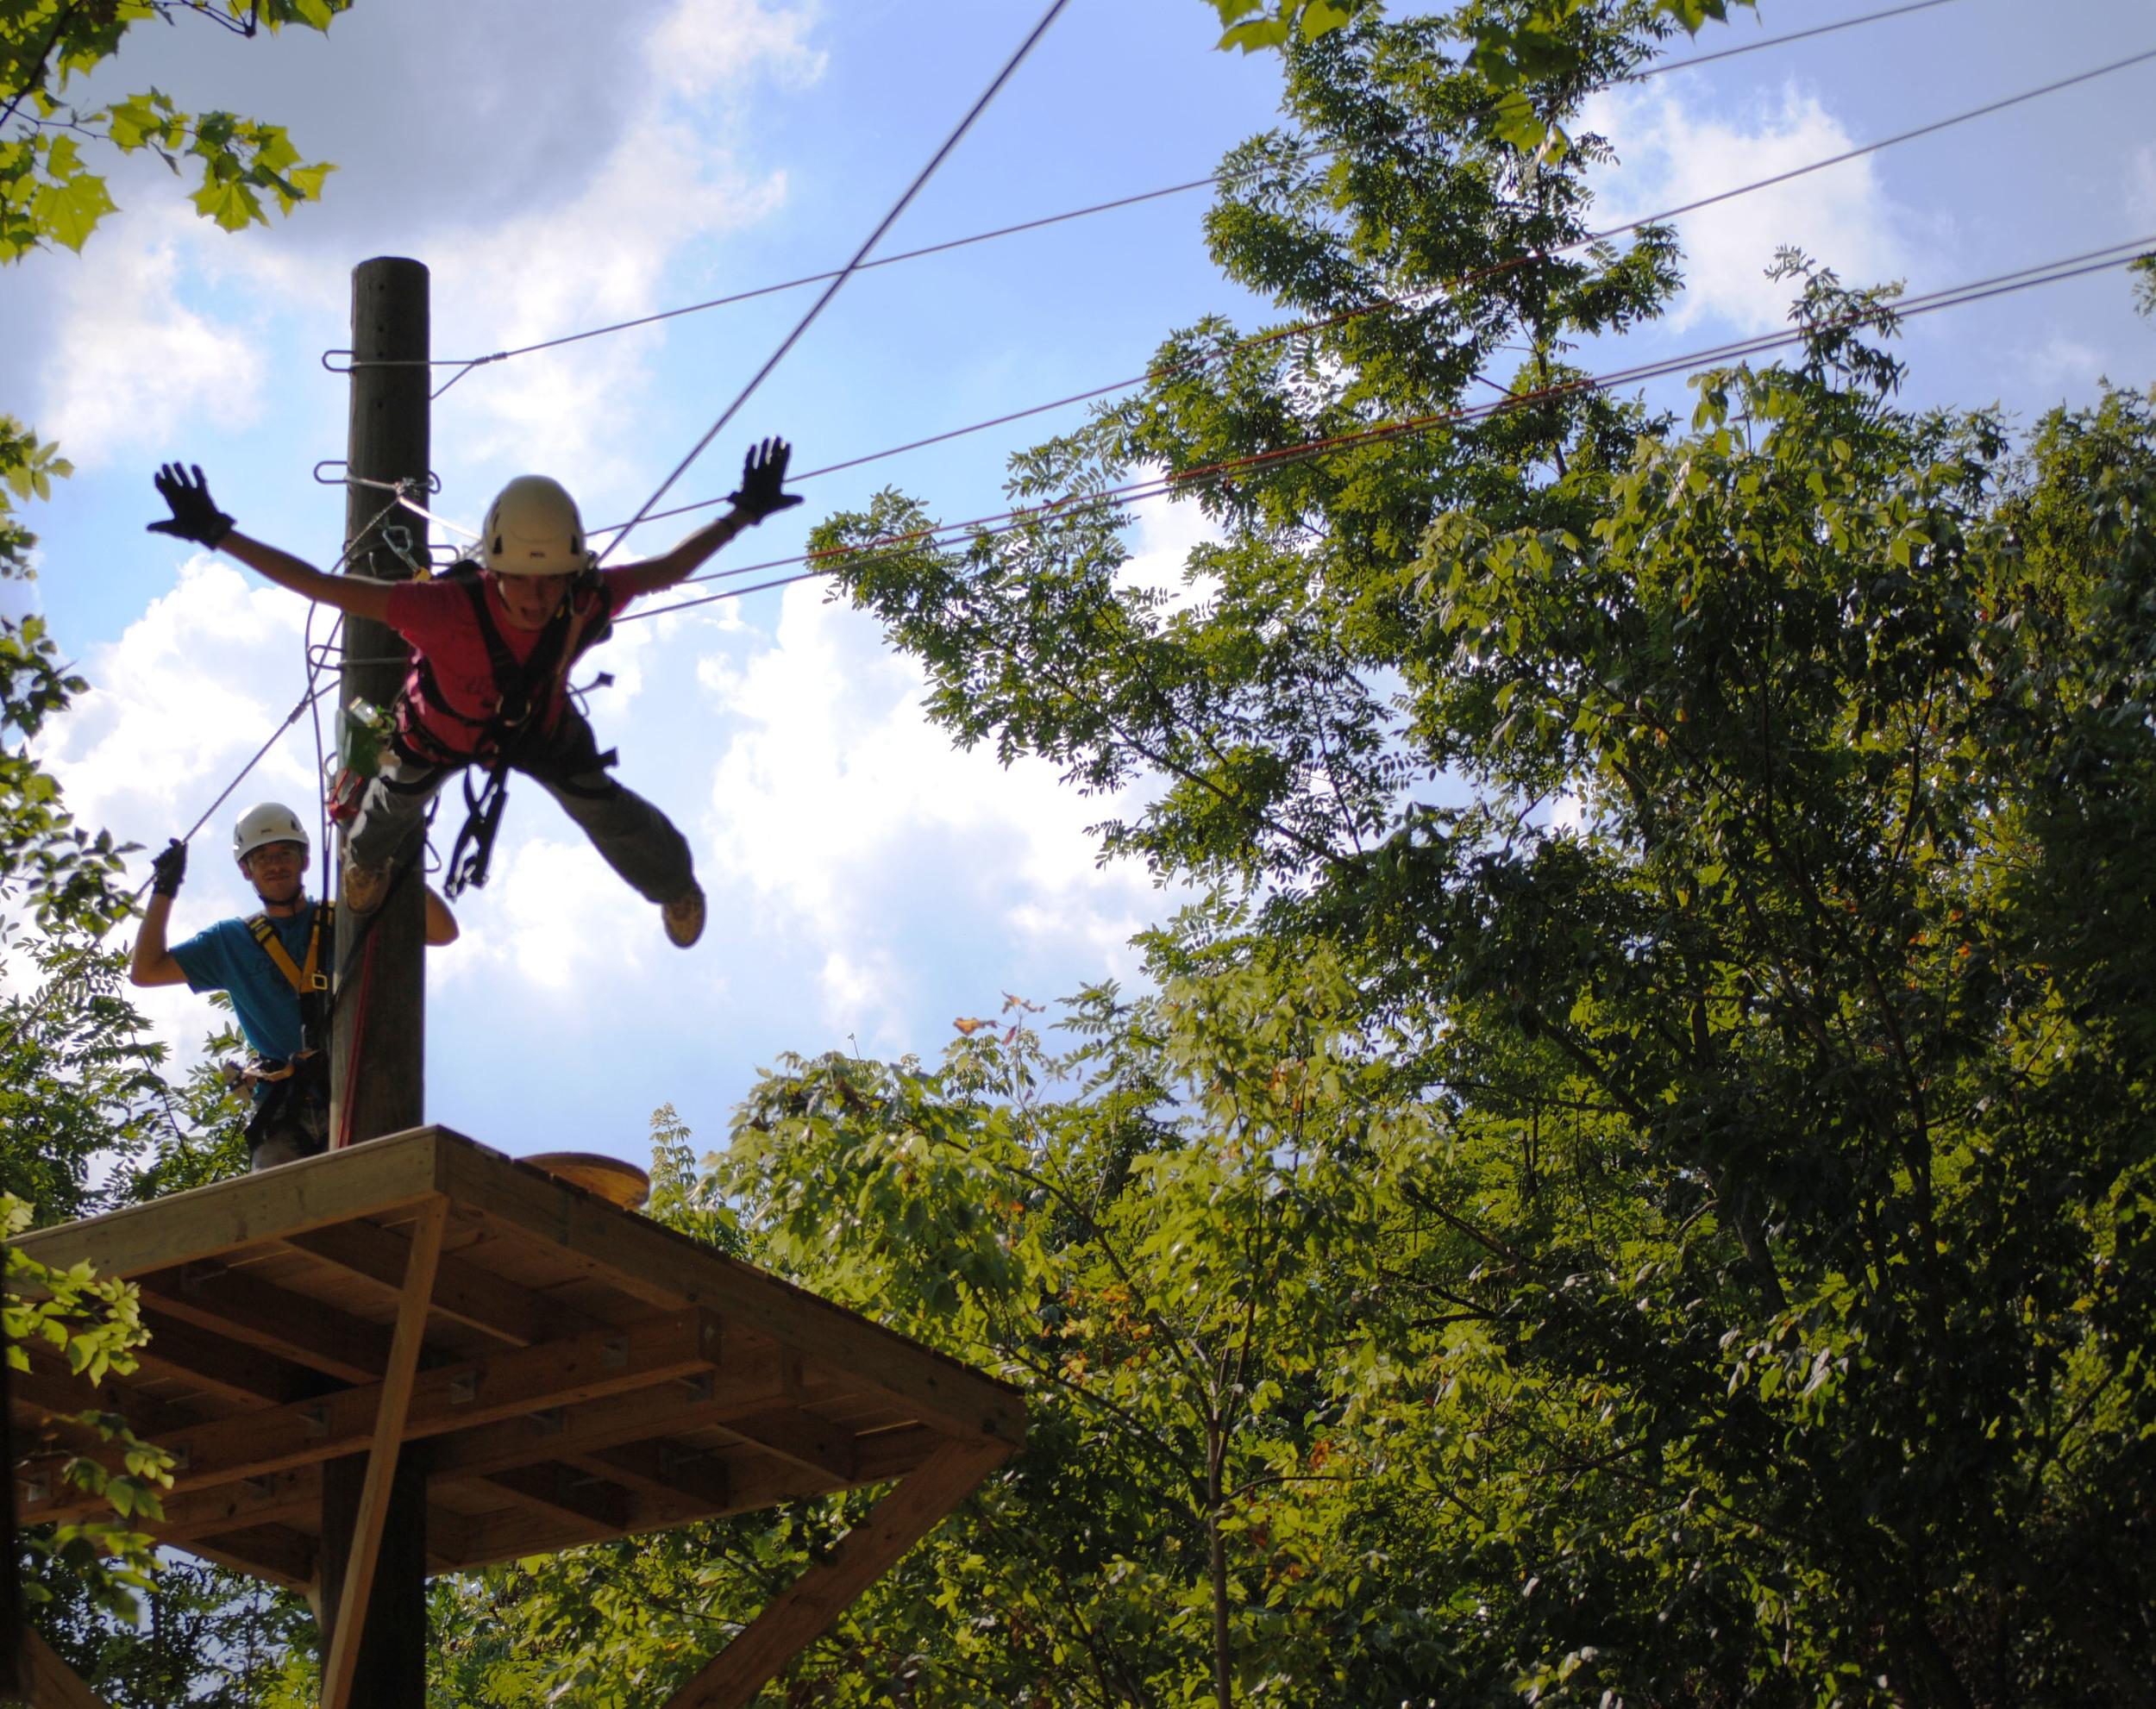 Defy Gravity Zip Line Leap of Faith